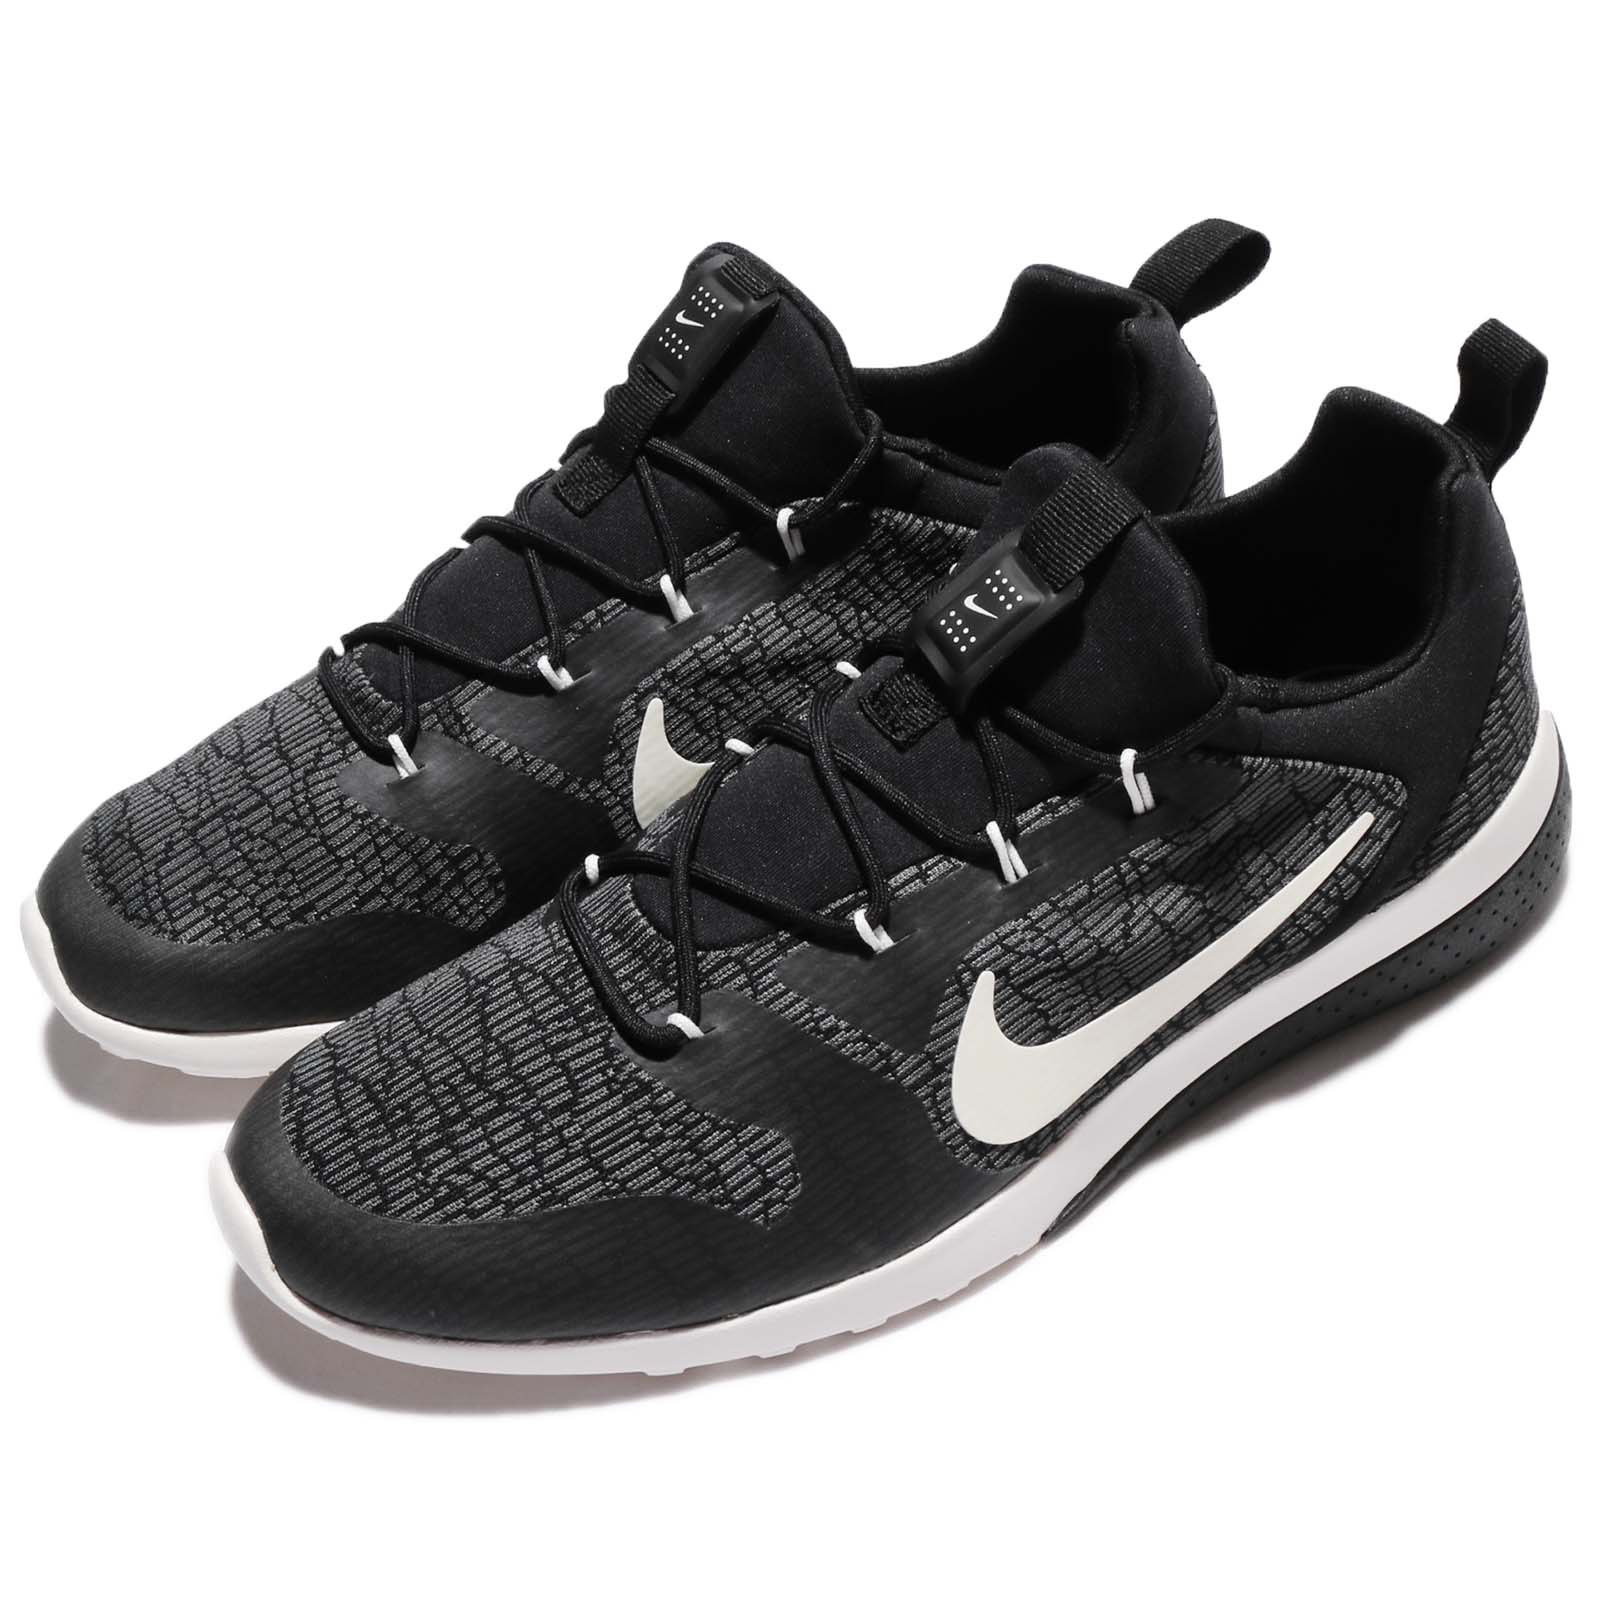 Nike 慢跑鞋 CK Racer 男女鞋 916780-001